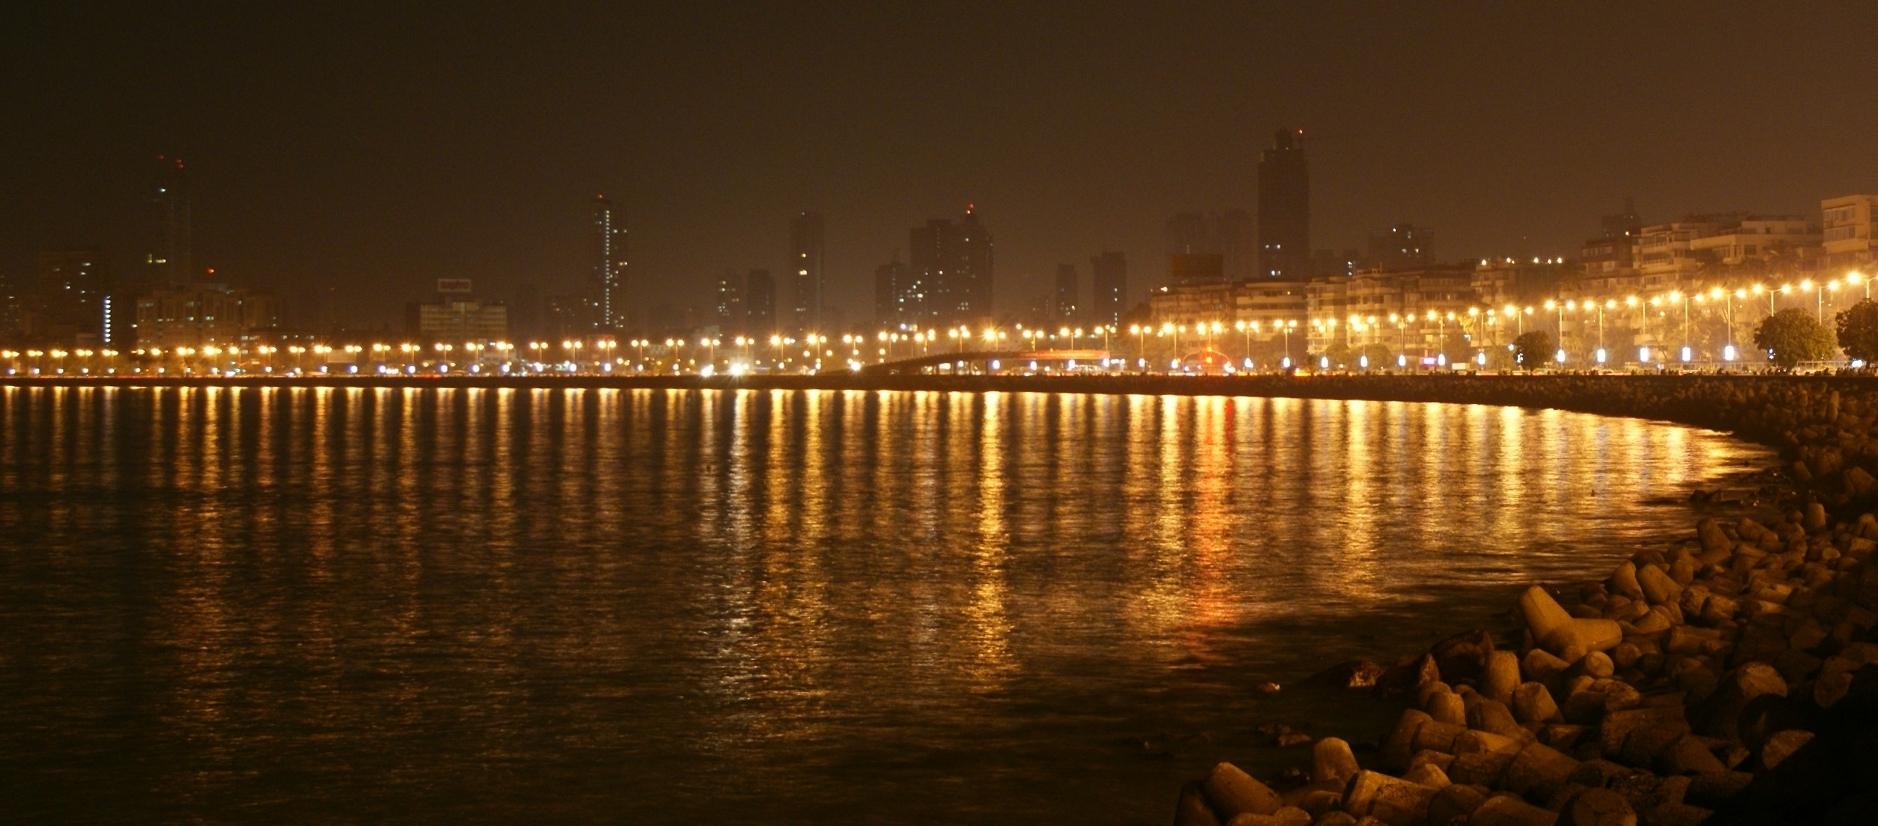 Marine Drive Mumbai Photos Images And Wallpapers Hd